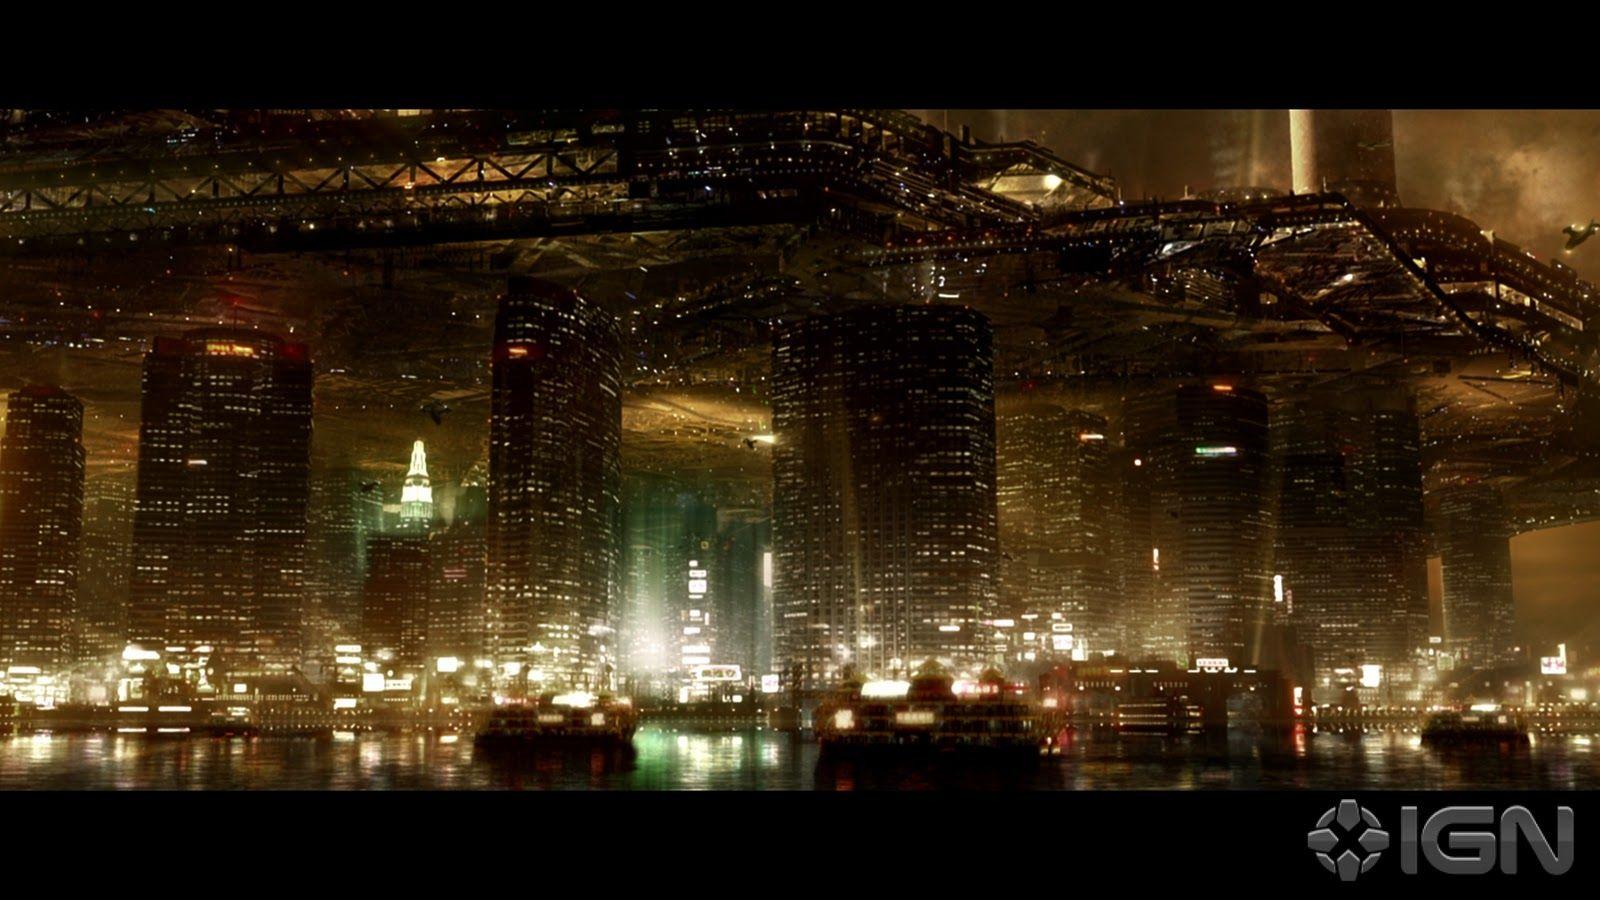 Deus Ex Screenshot Cyberpunk Slums What Is Cyberpunk Futuristic City Deus Ex Human